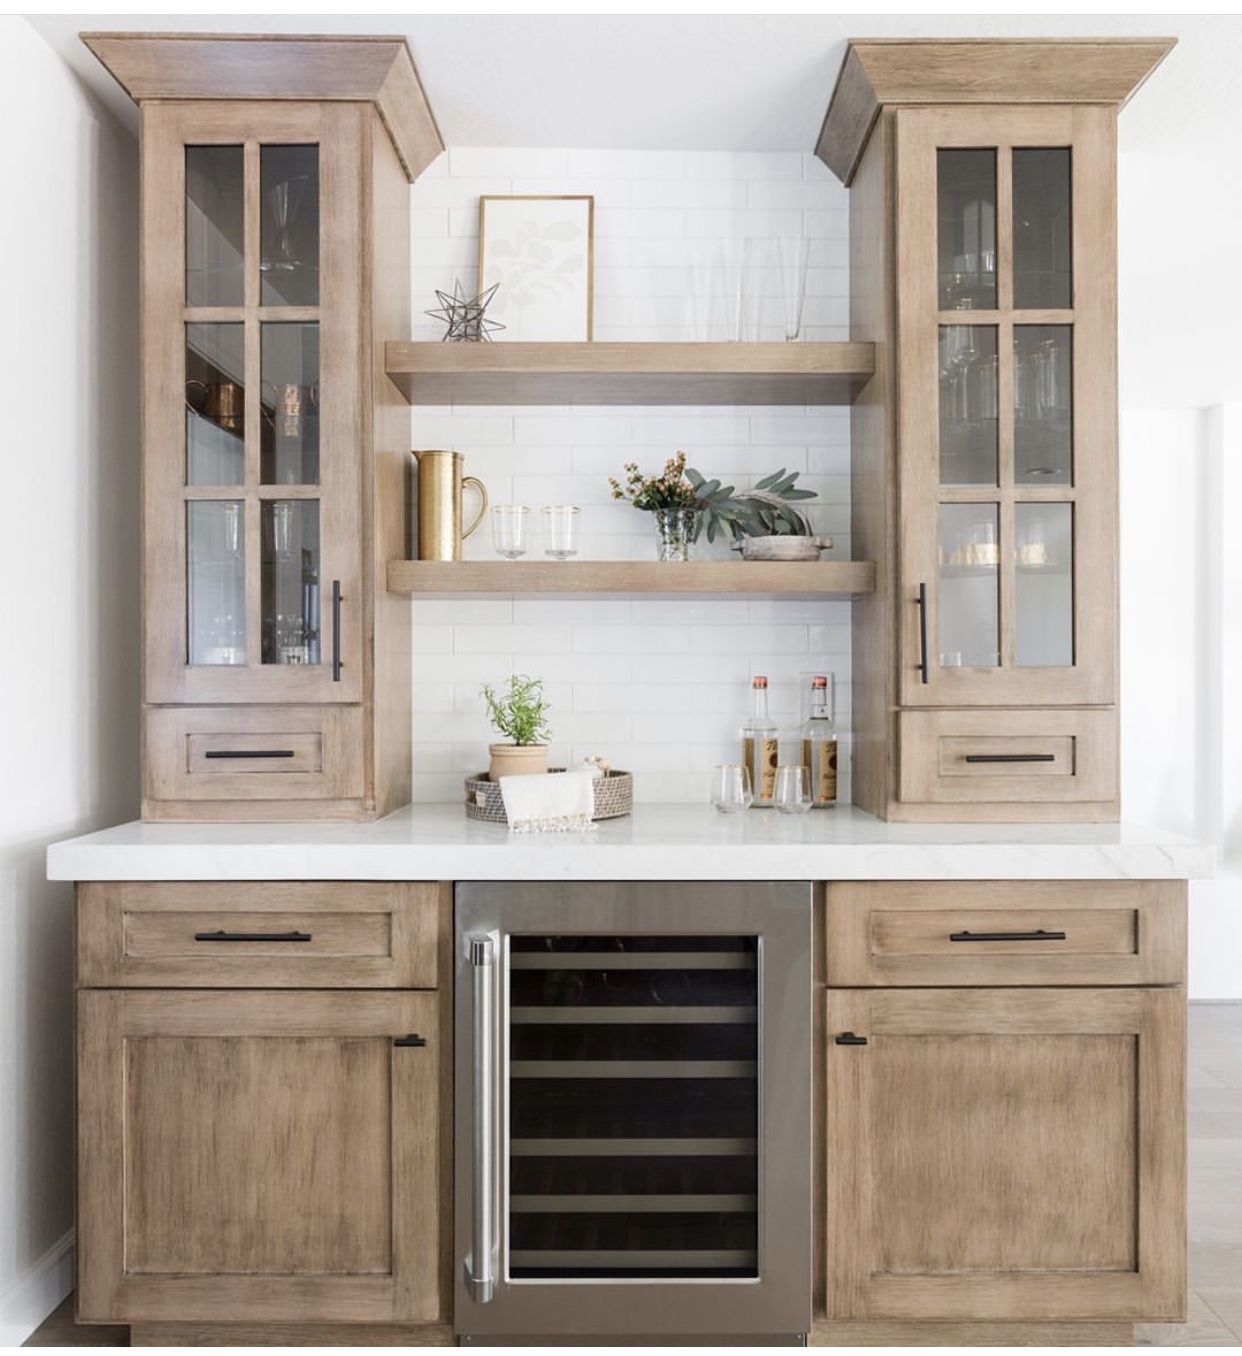 Coffee bar Architecture: Kitchen Cabinets & Interior Design – Jonathan Alonso Si…